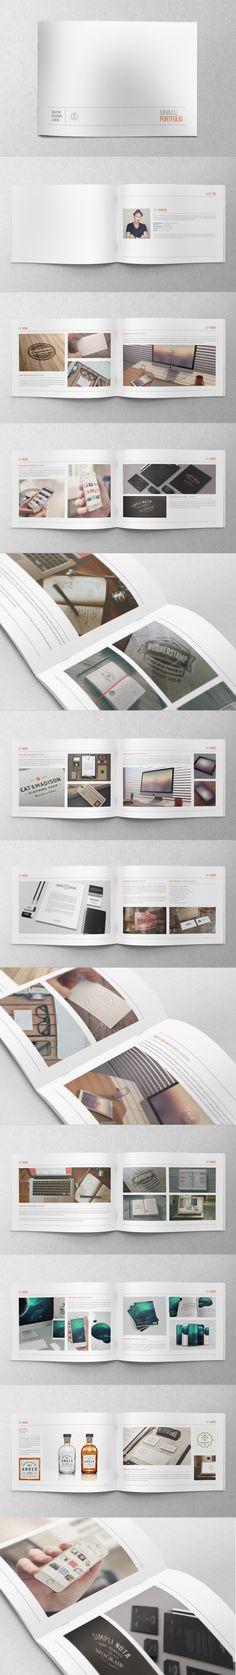 Minimal Hipster Design Portfolio. Download here: http://graphicriver.net/item/minimal-hipster-design-portfolio/8104827?ref=abradesign #design #brochure #portfolio #hipster